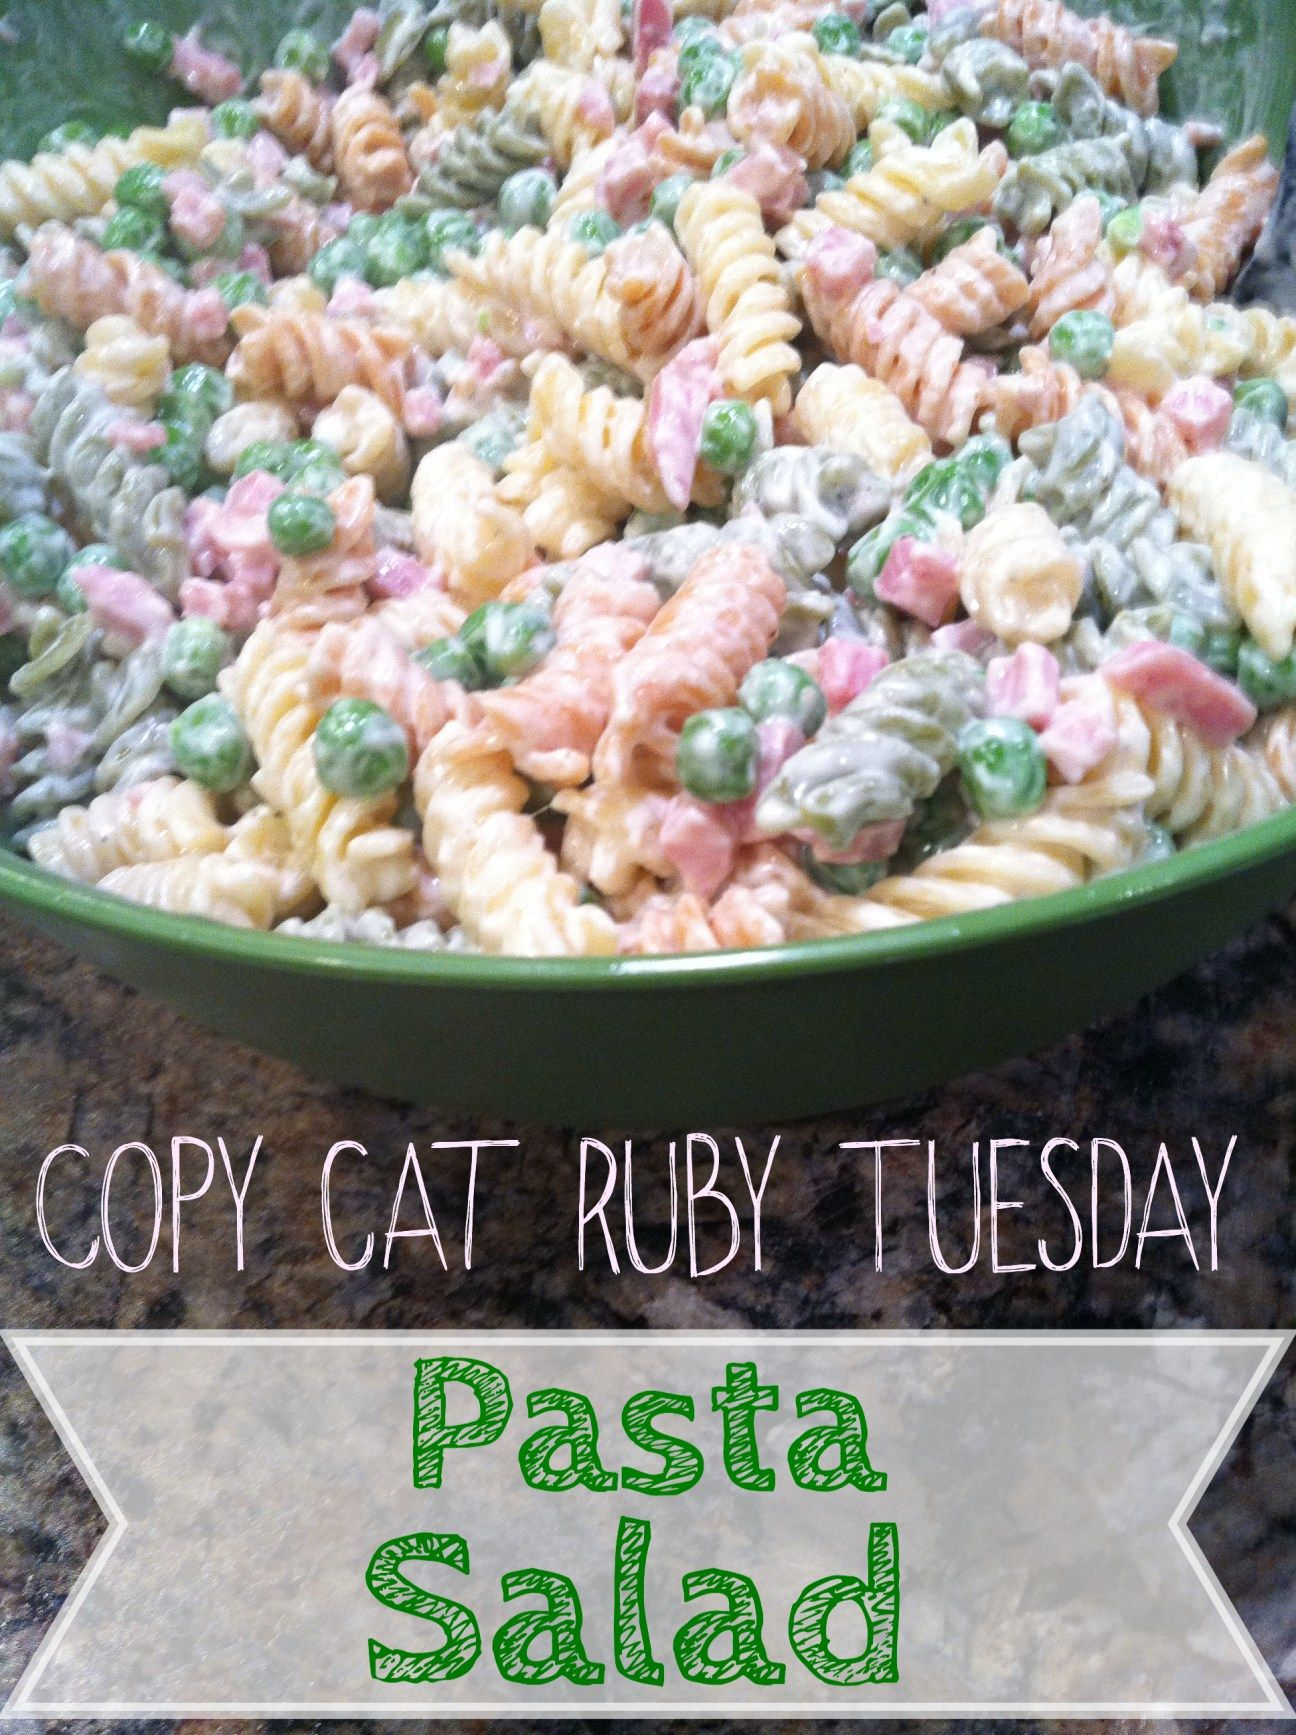 1 Box Rotini Pasta The Colorful Kind So It S Pretty Like